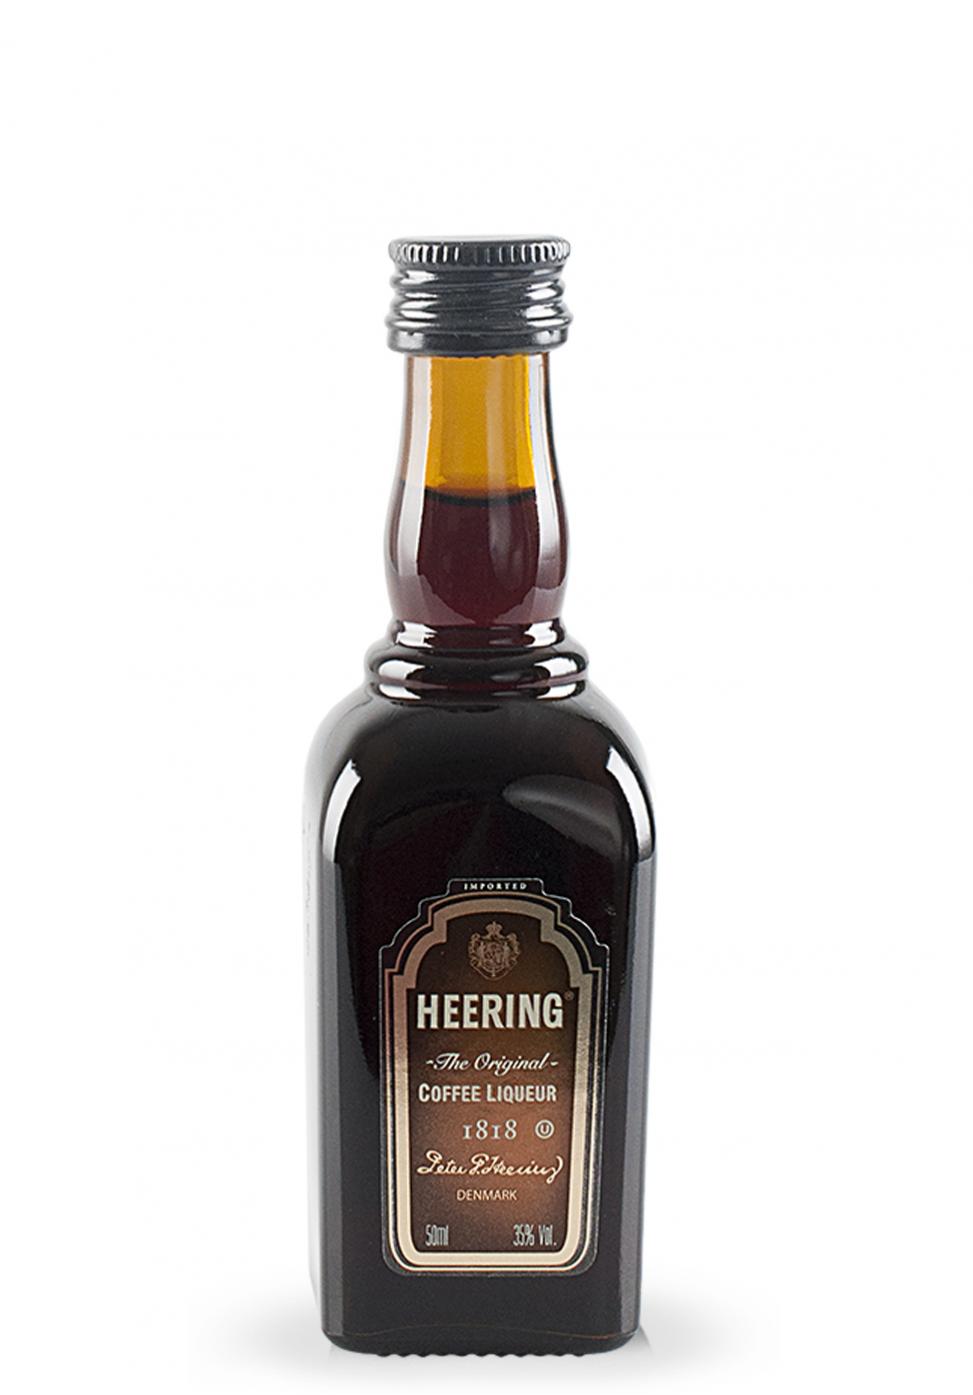 Lichior Heering The Original Coffee (0.05L)